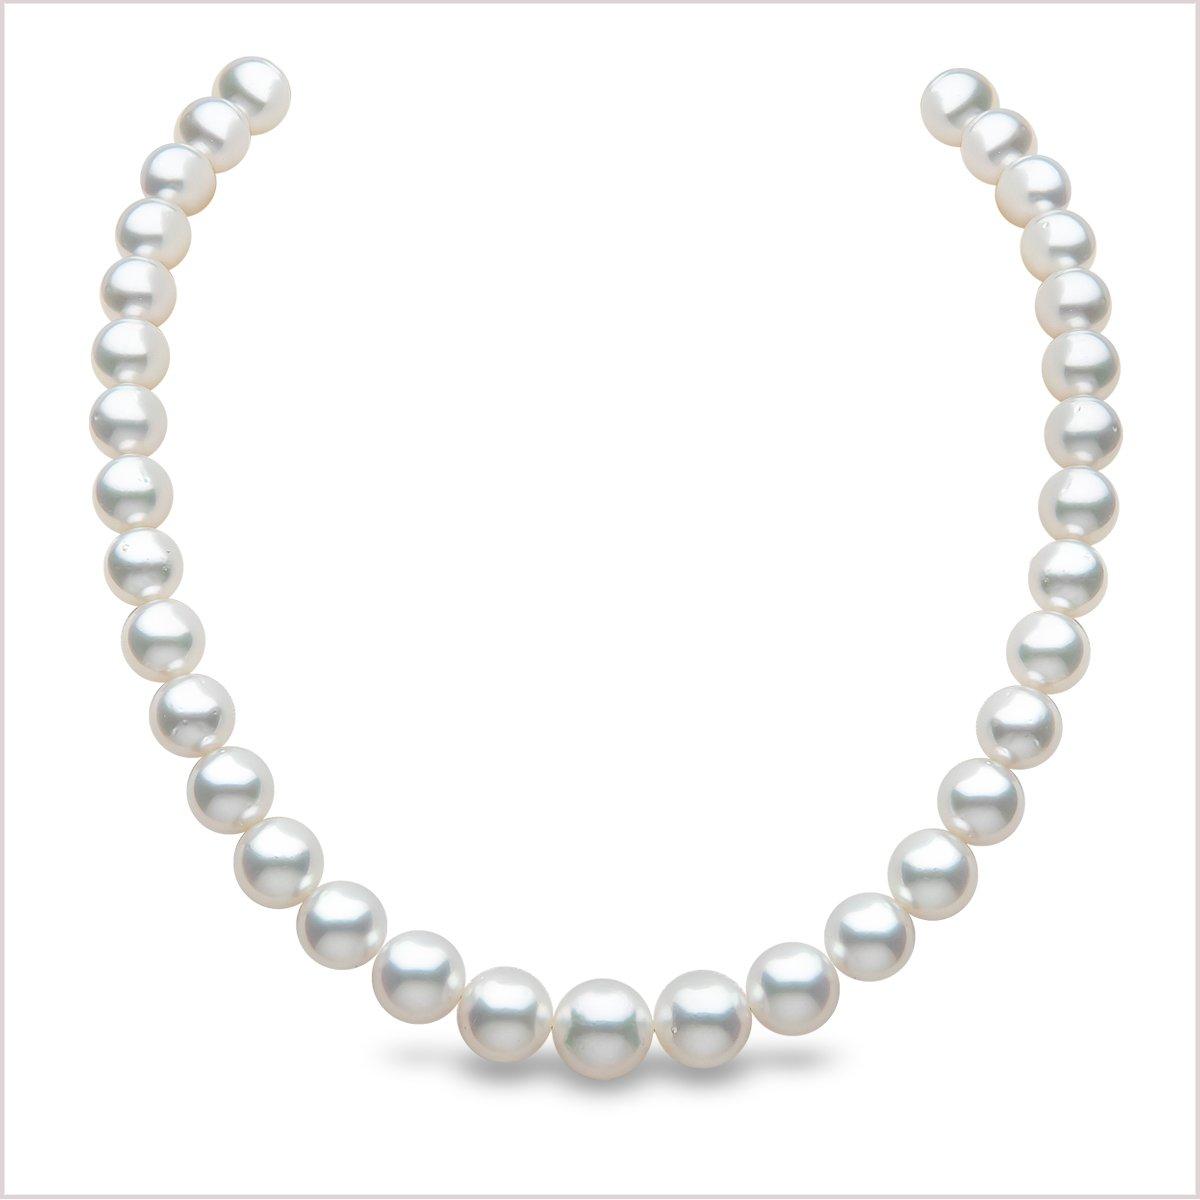 Yoko London Classic South Sea Pearl Necklace